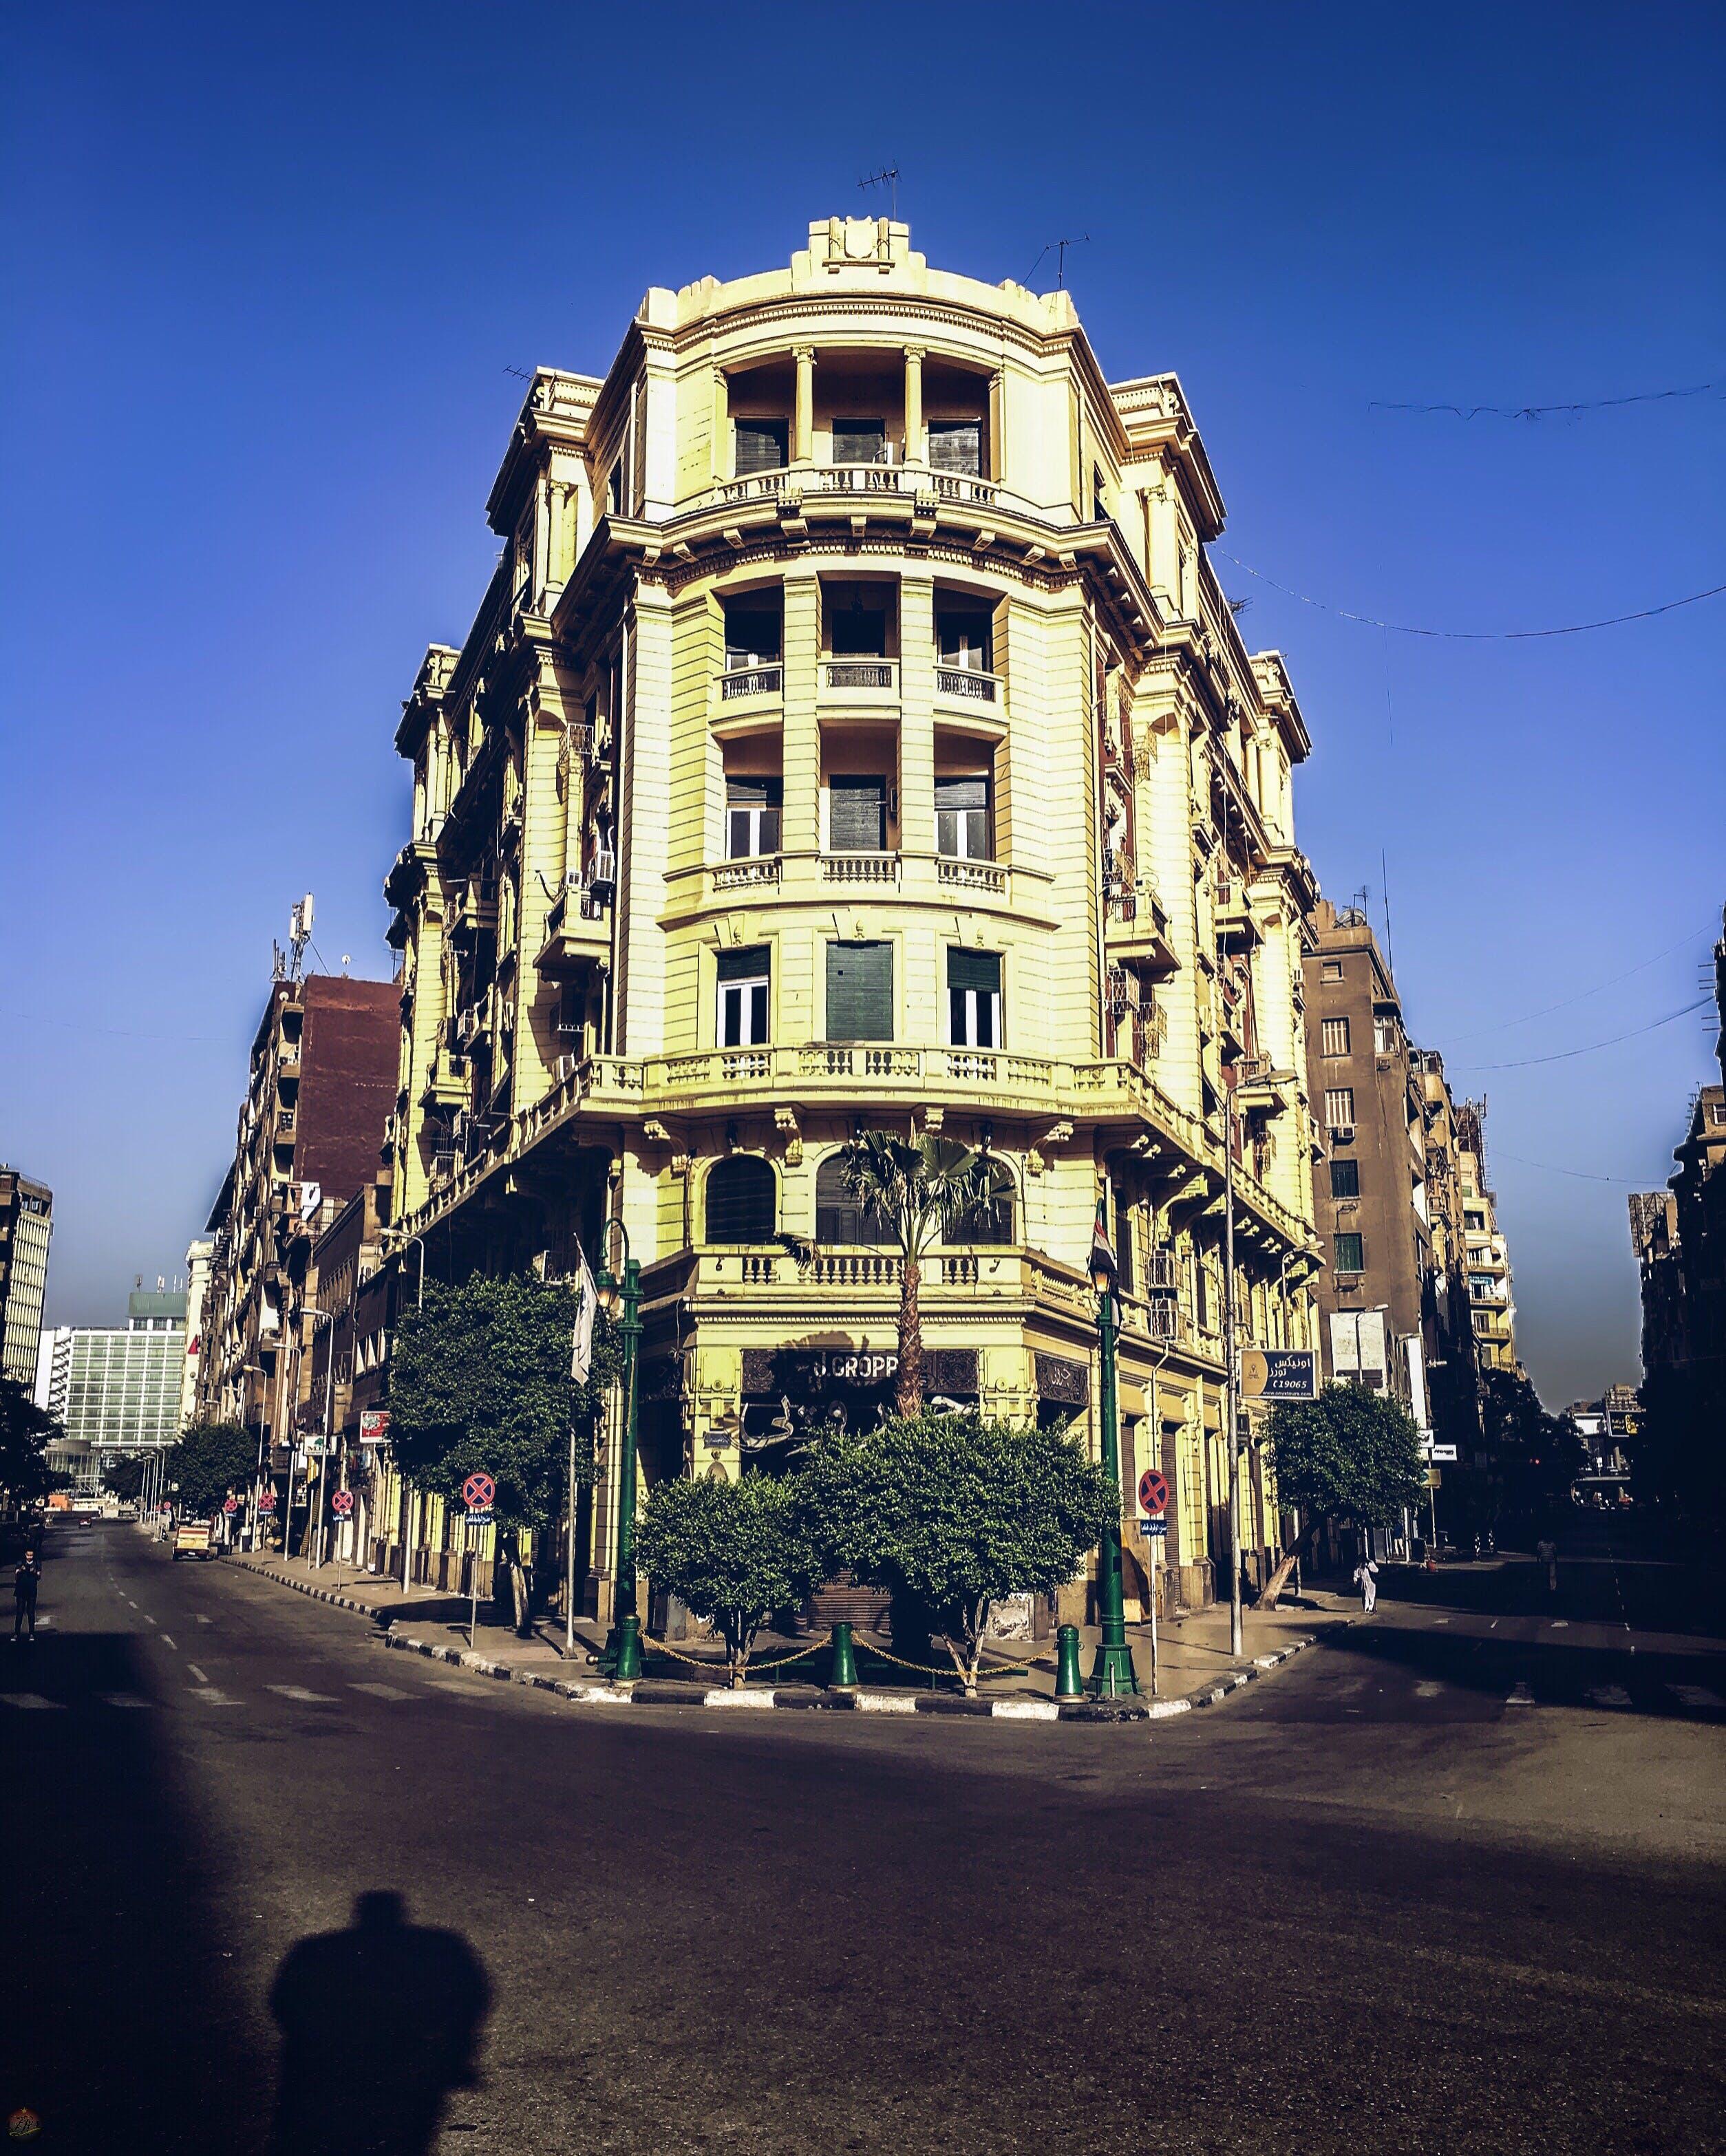 Free stock photo of buildings, shadow, street, traffic light